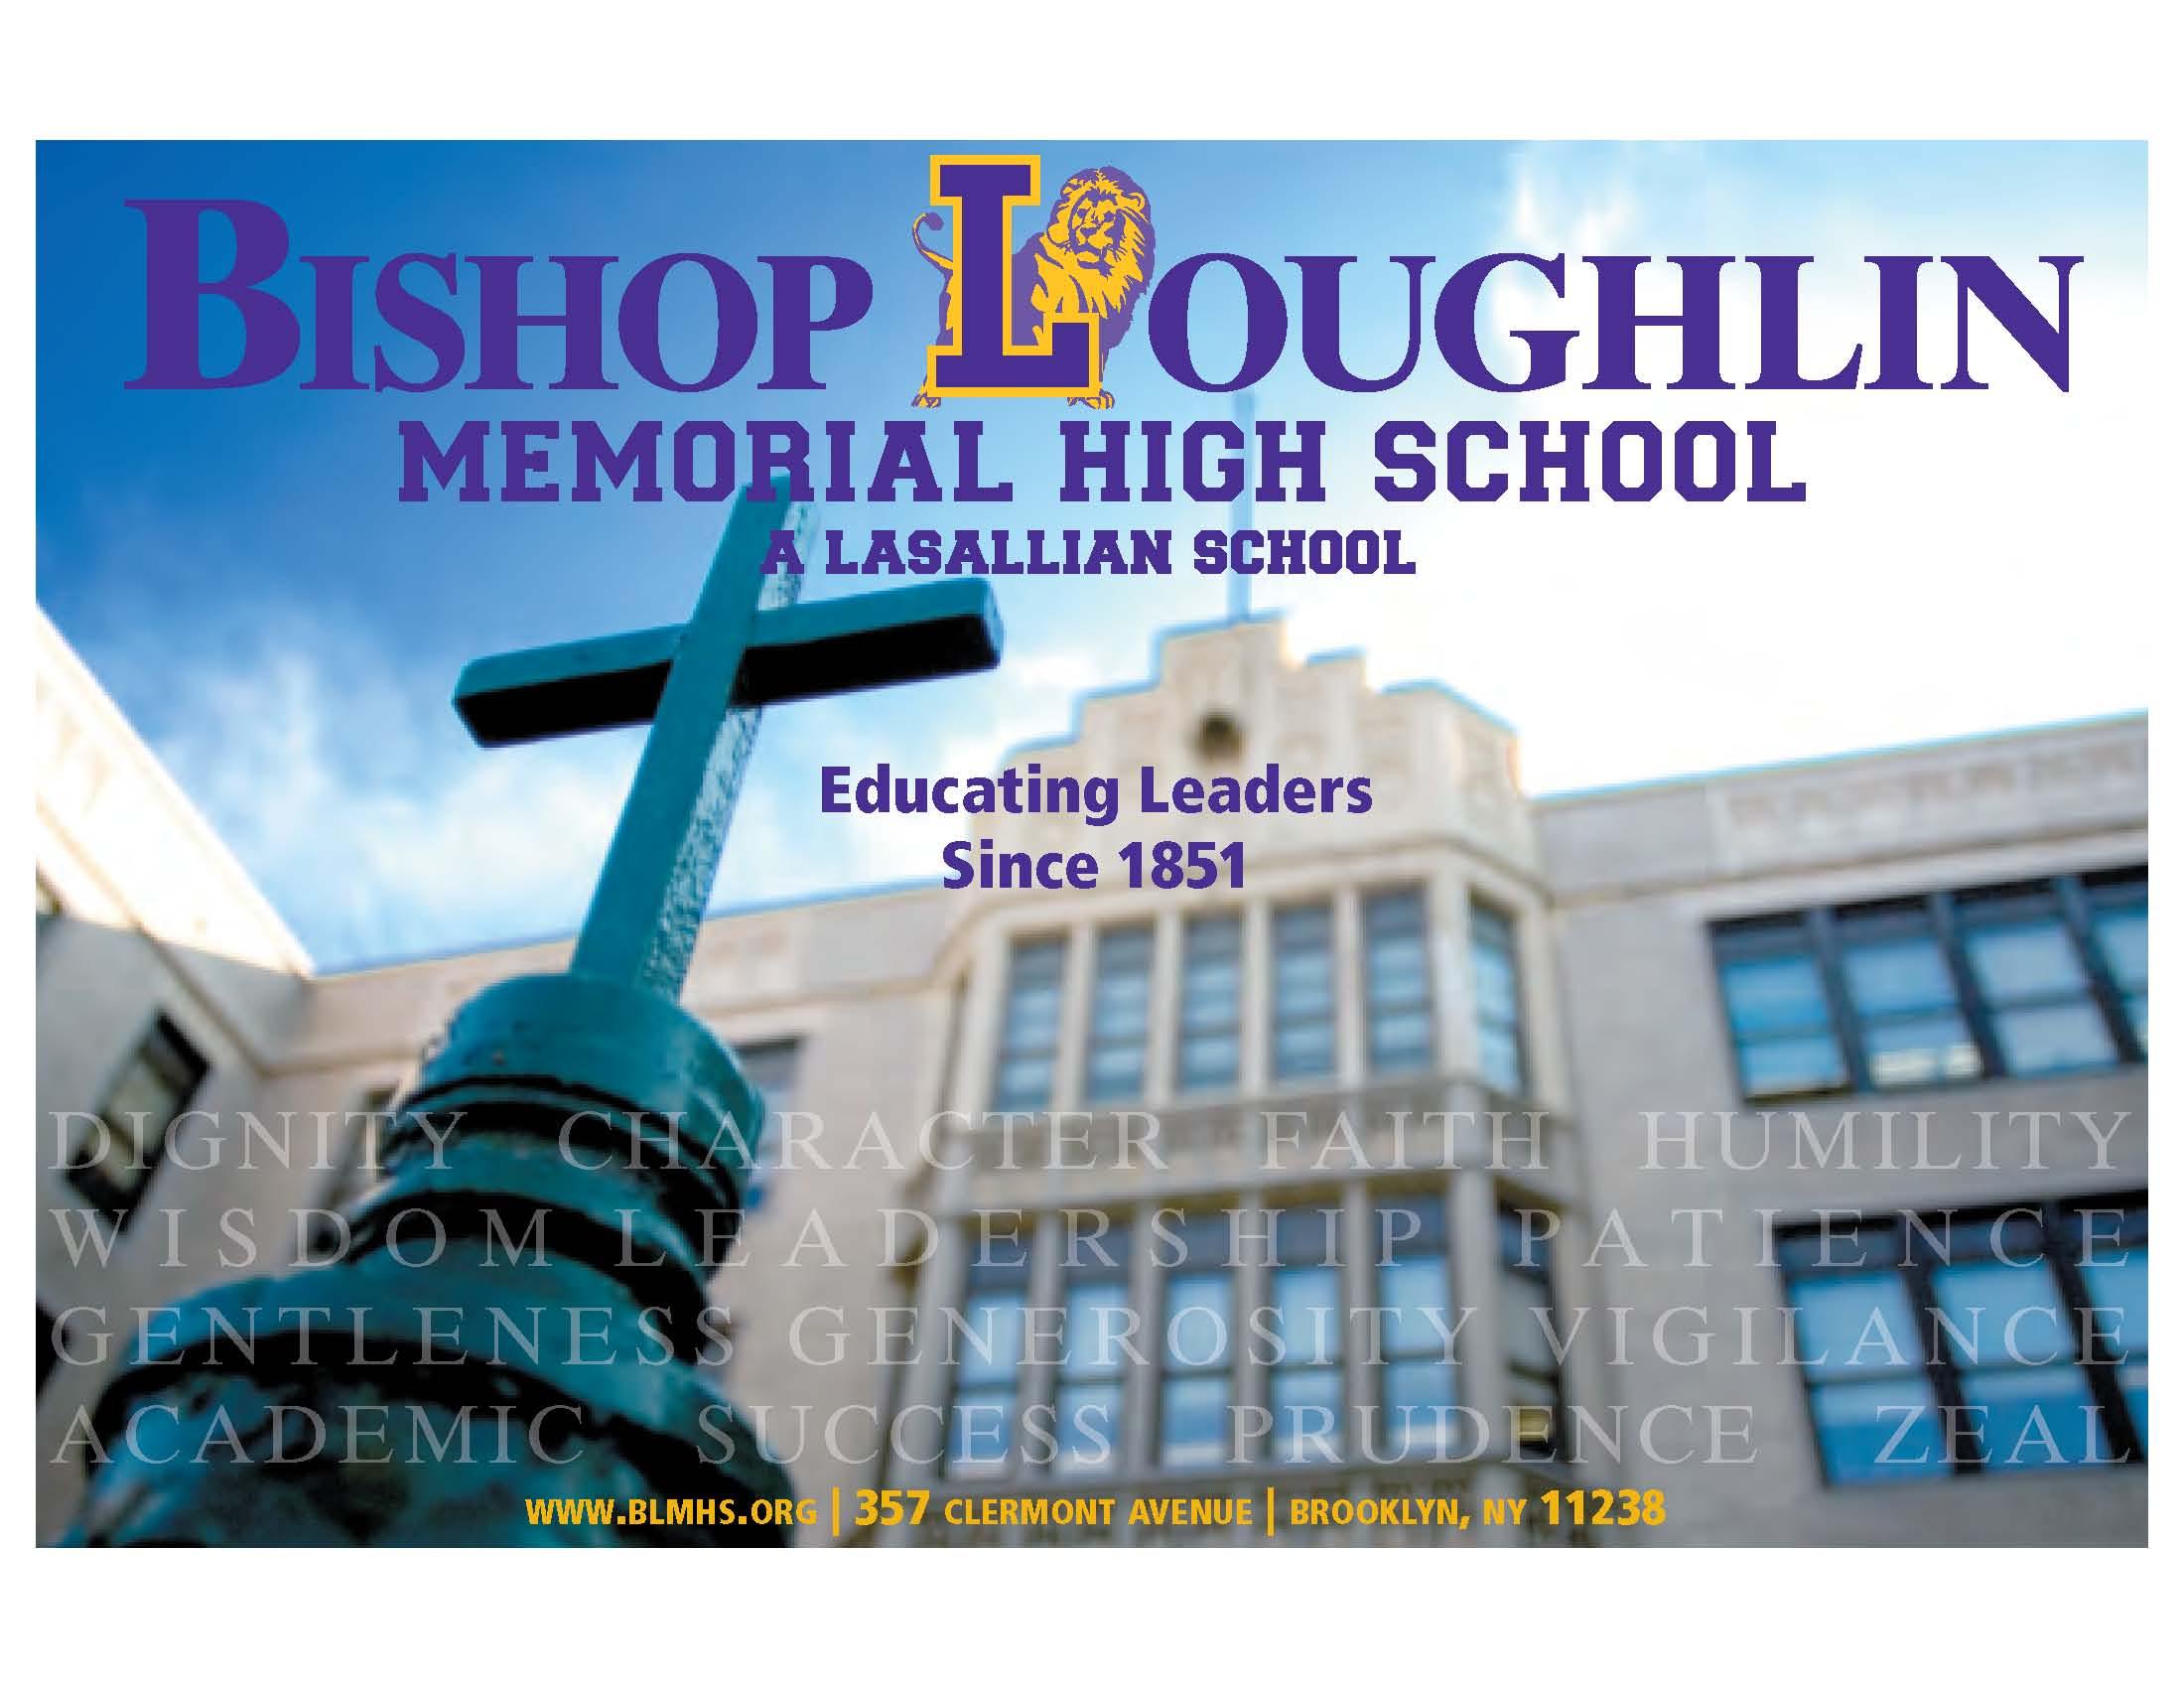 Bishop Loughlin.jpg